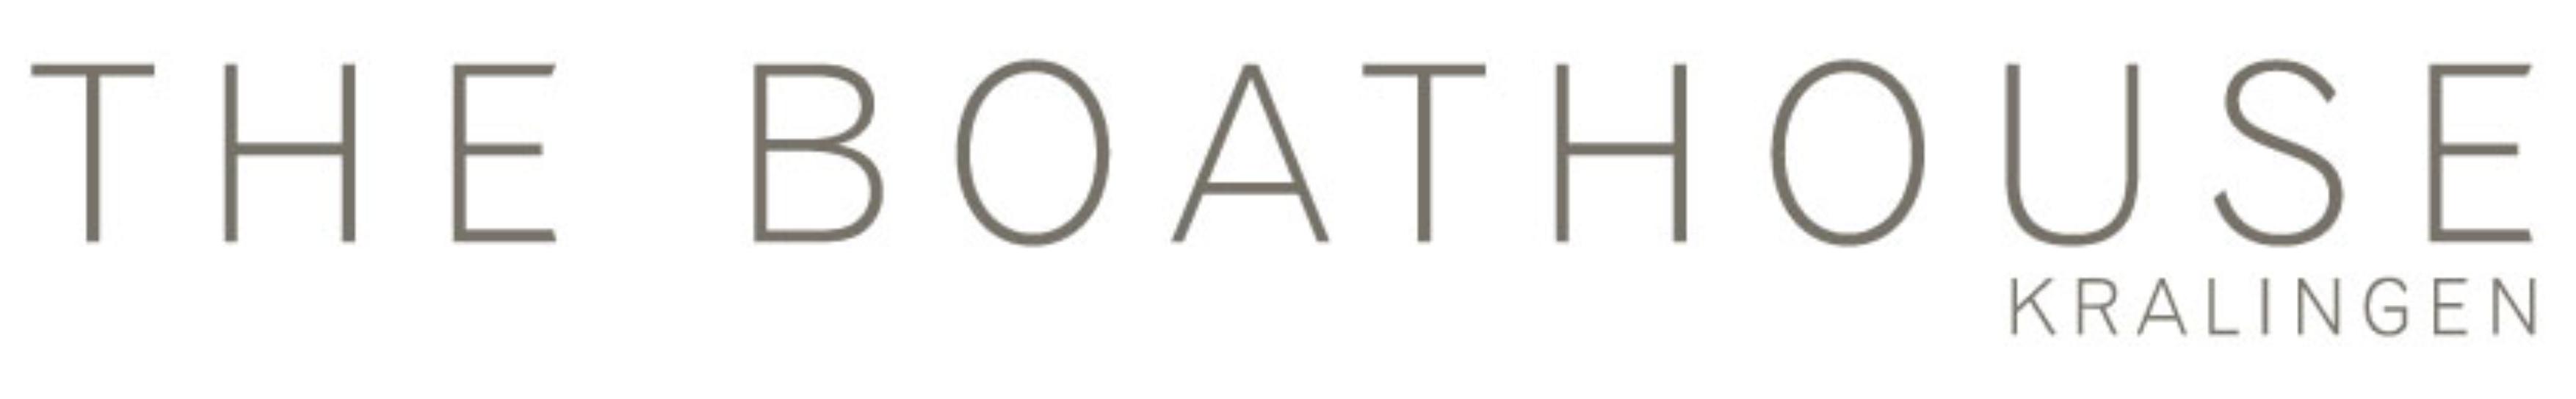 Boathouse_Logo_ nieuw 2016